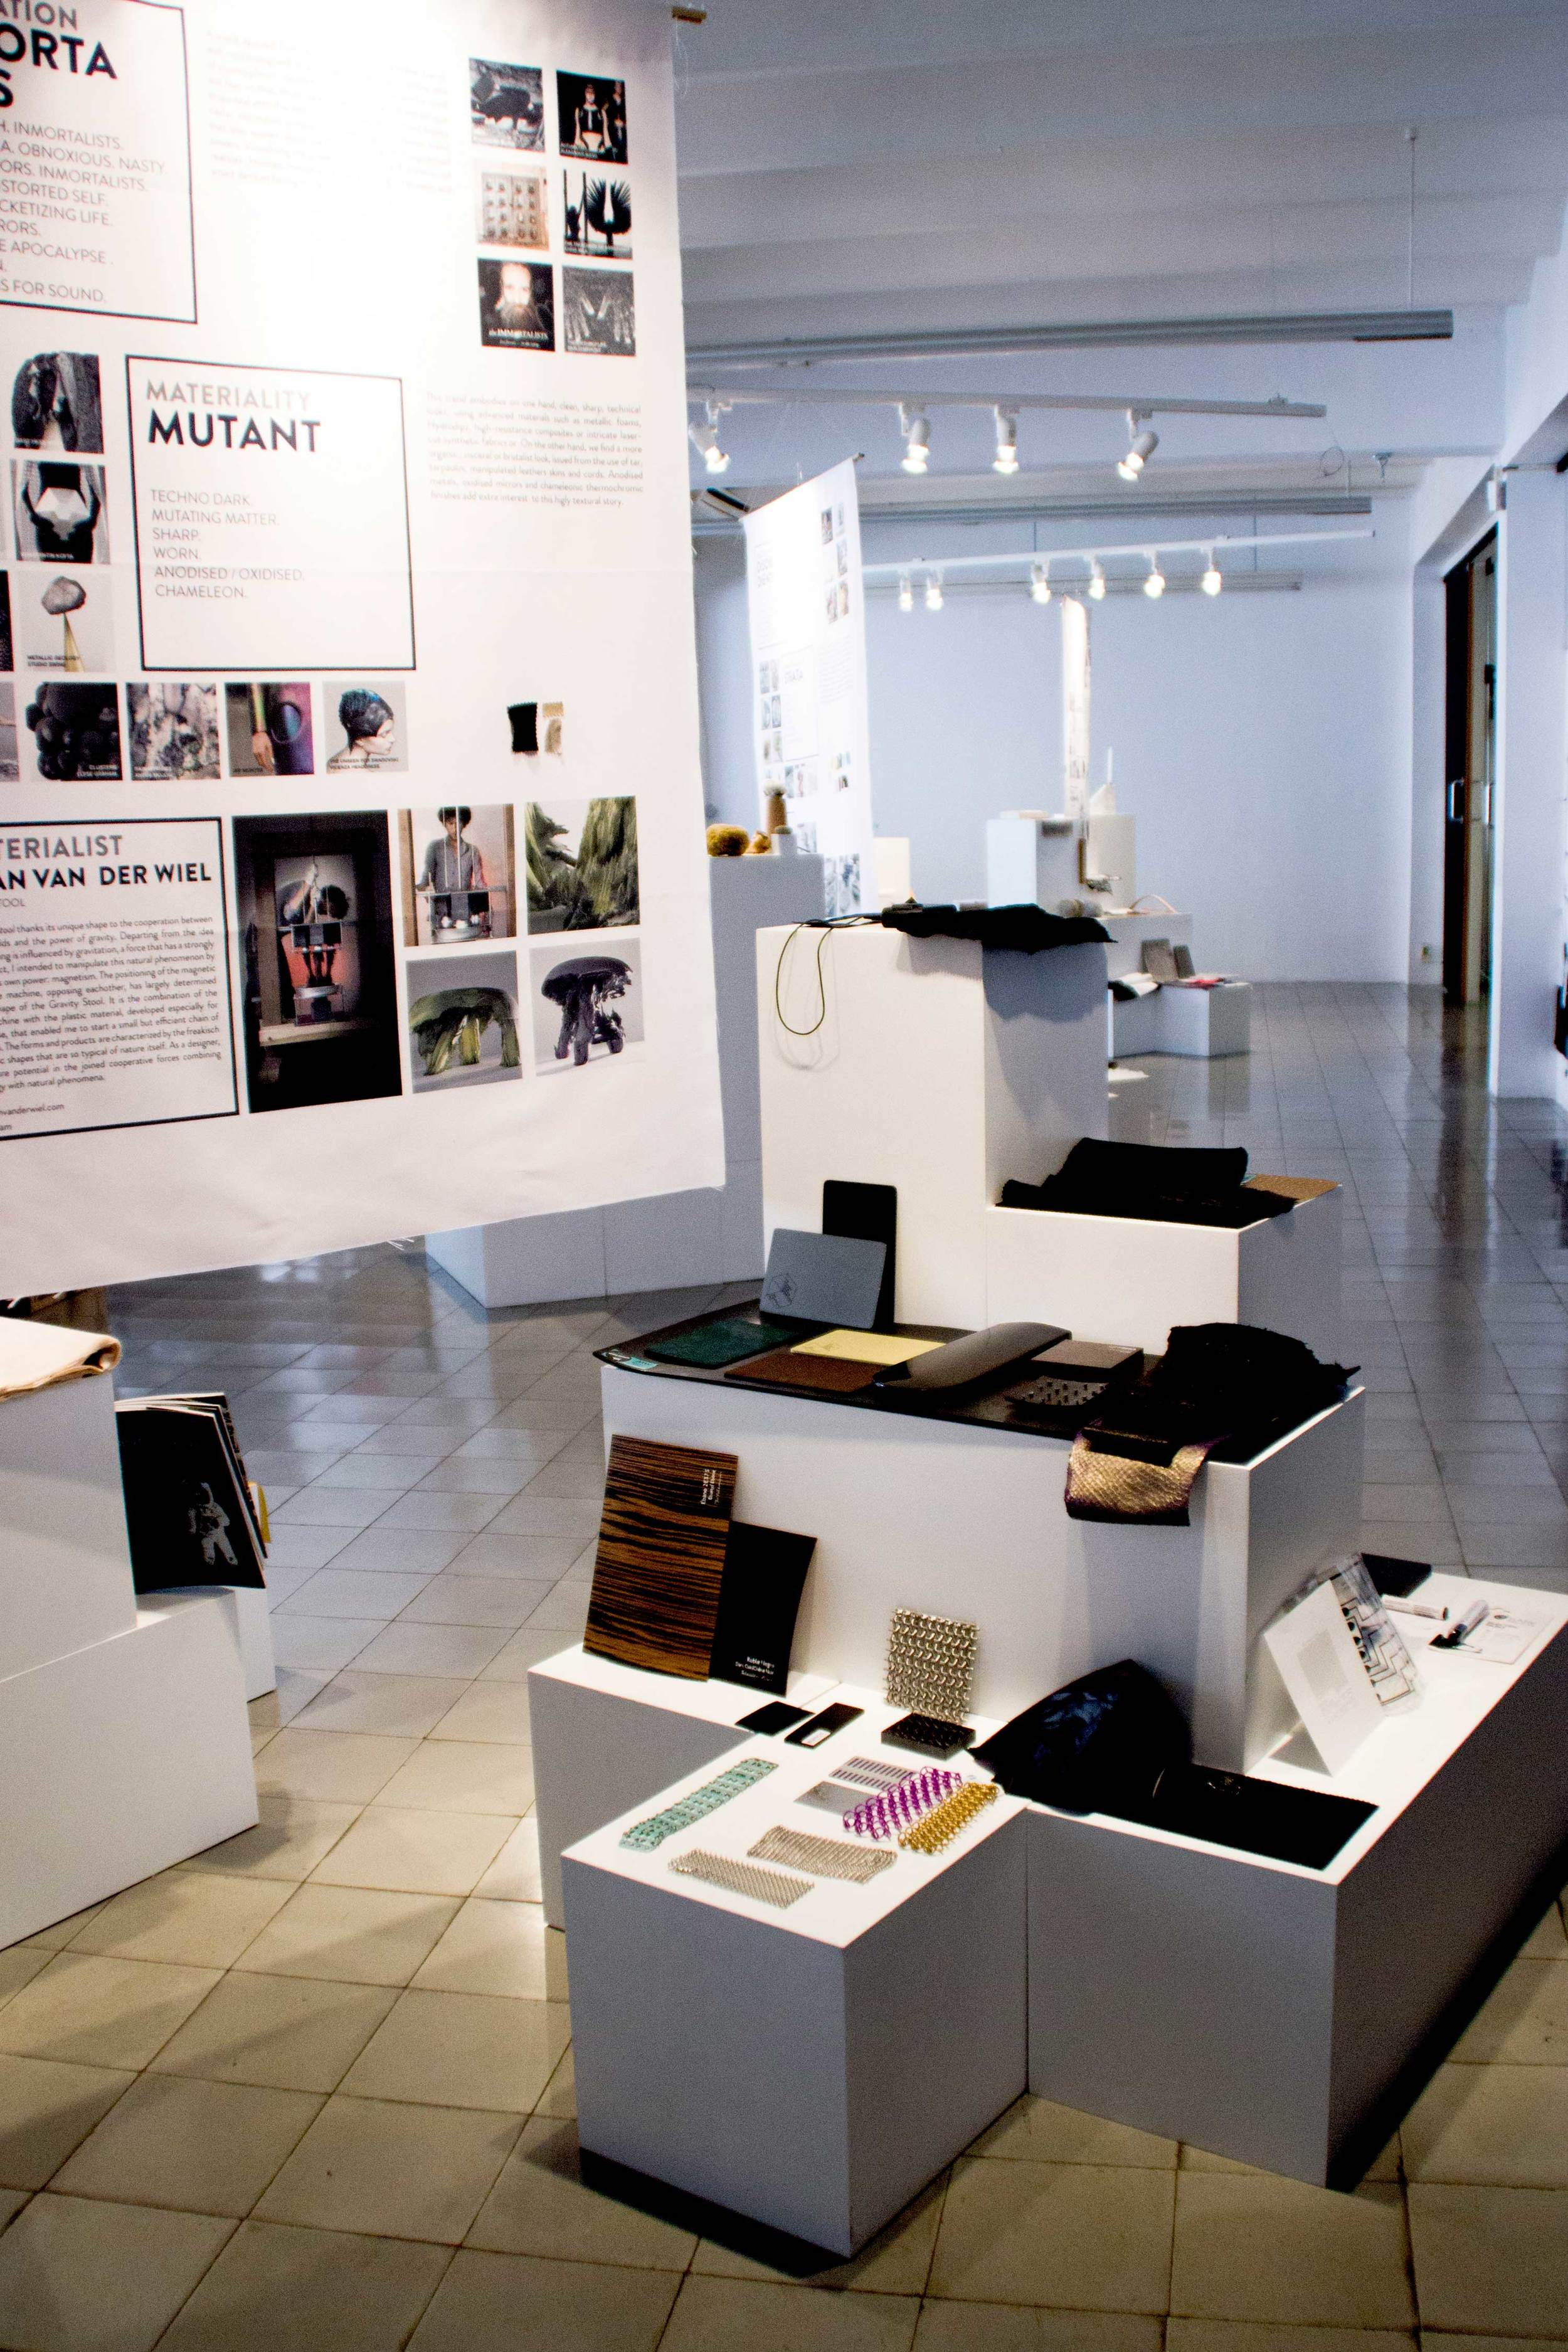 retail_popup_exhibition.jpg